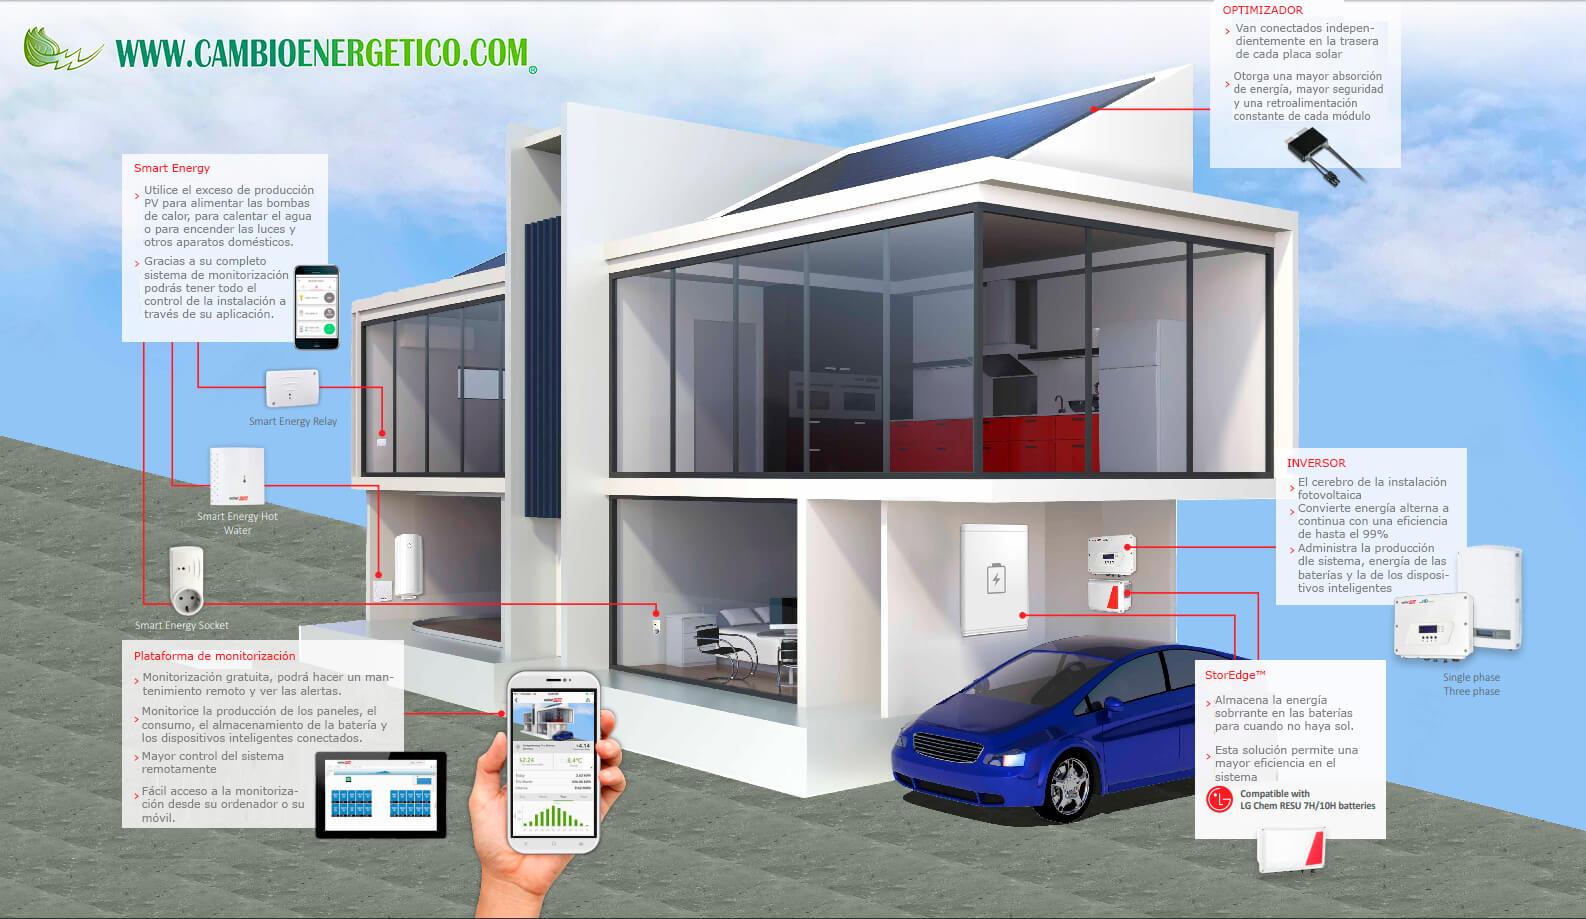 infografia inversor solaredge